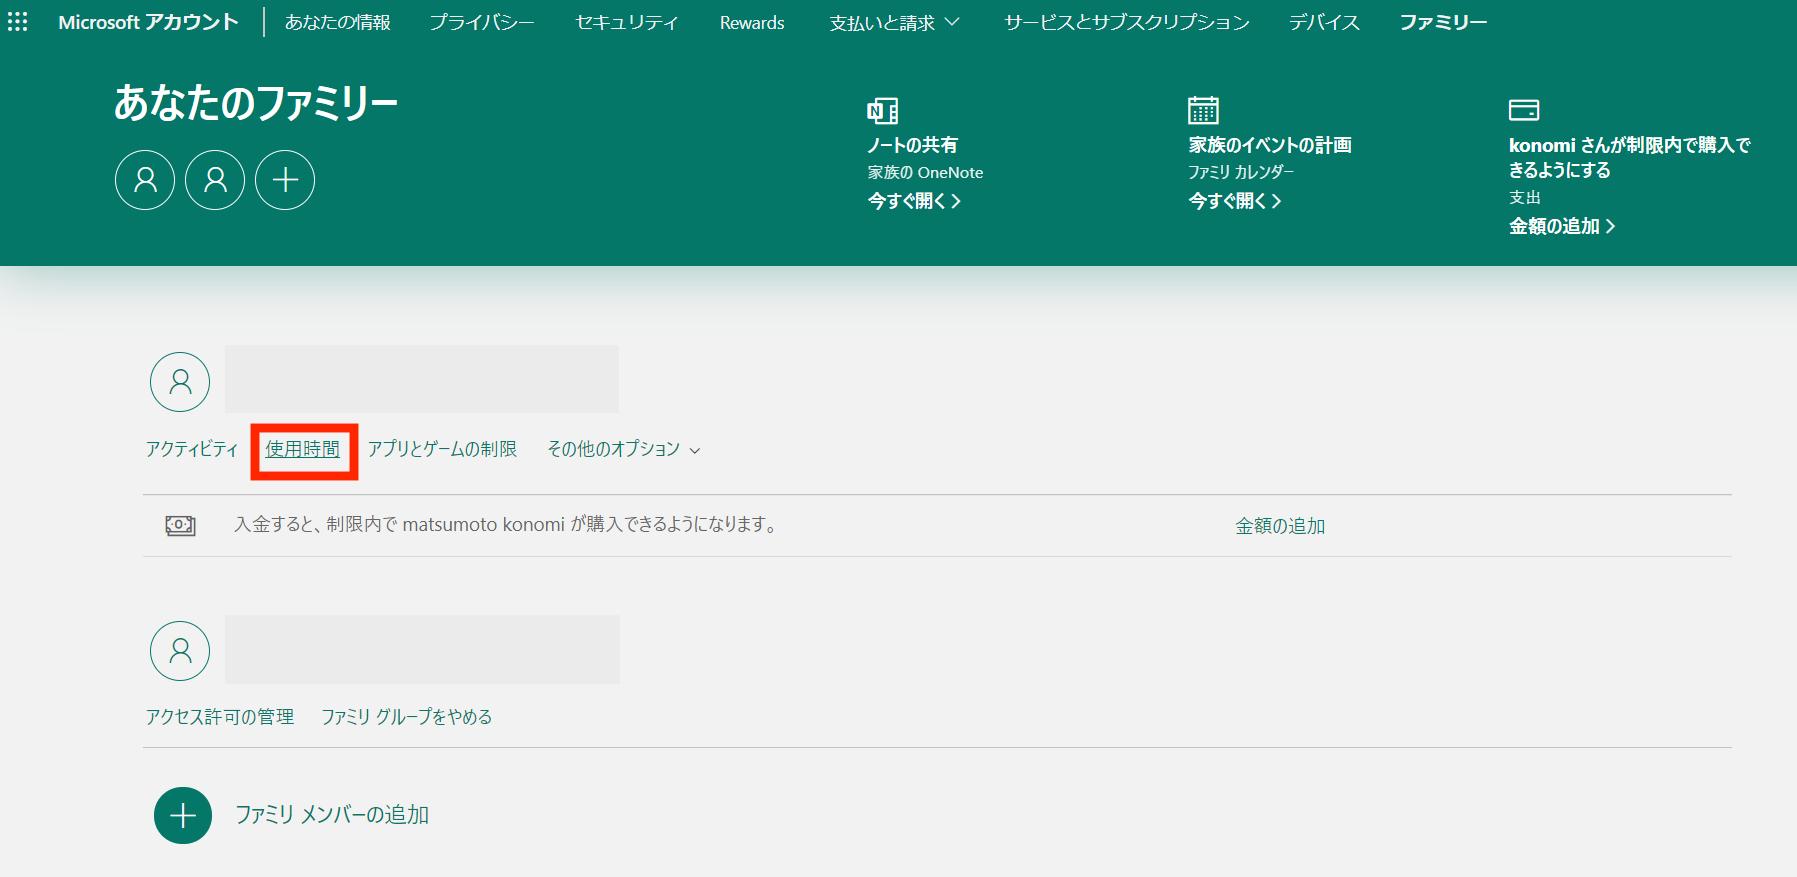 【Windows】ファミリー機能の使い方4